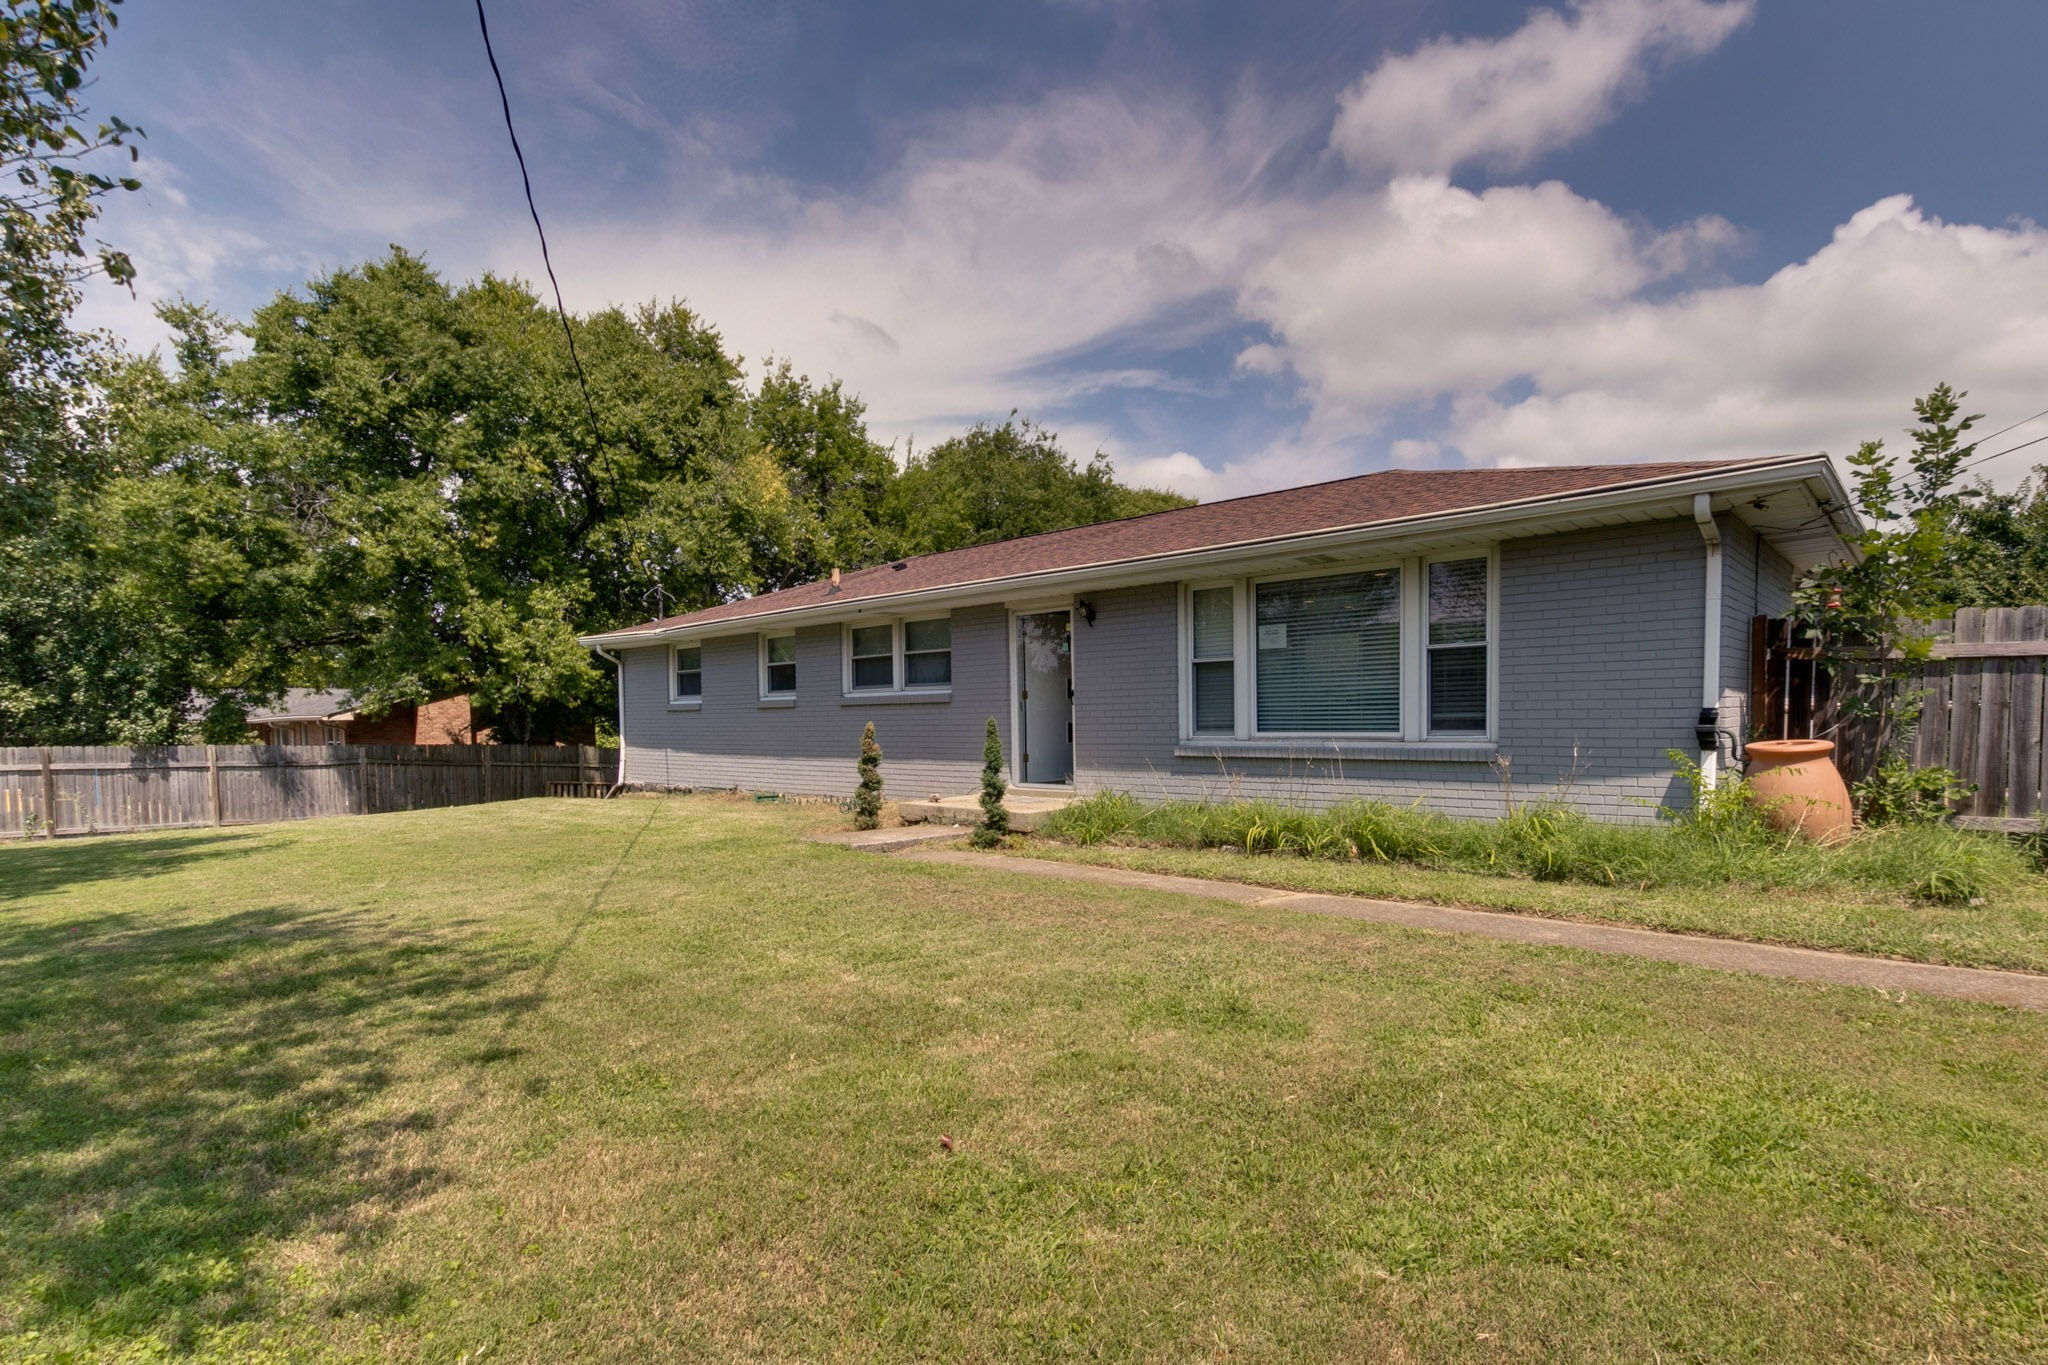 559 Joyce Ln, Nashville, TN 37216 - Nashville, TN real estate listing